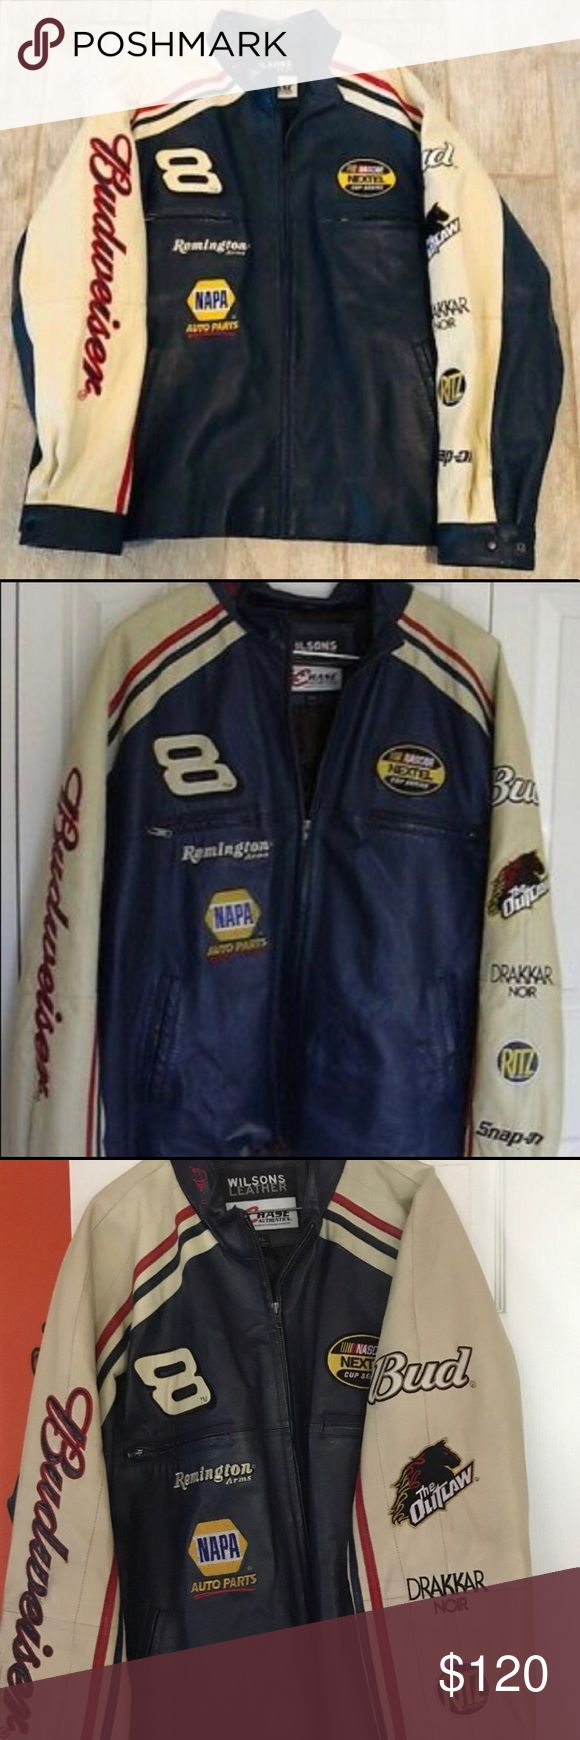 Wilson's Leather Dale Earnhardt NASCAR Jacket Wi…